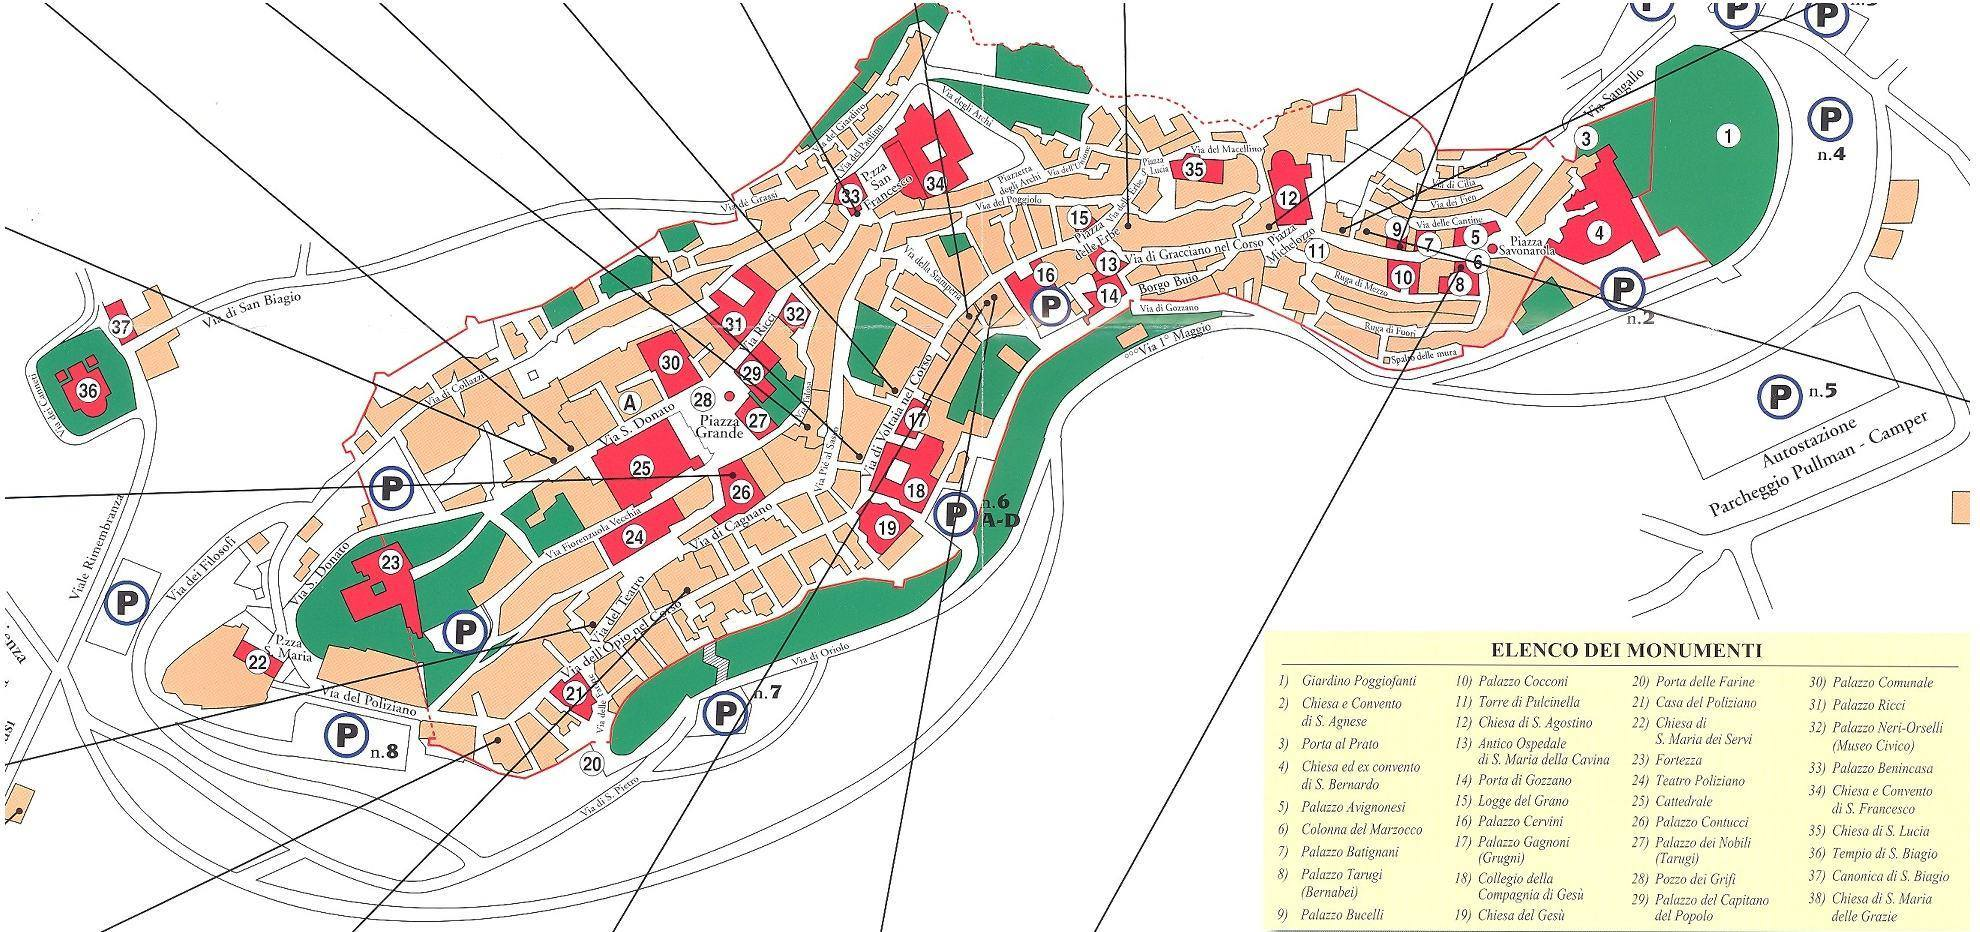 Mappa Di Montepulciano Cartina Di Montepulciano